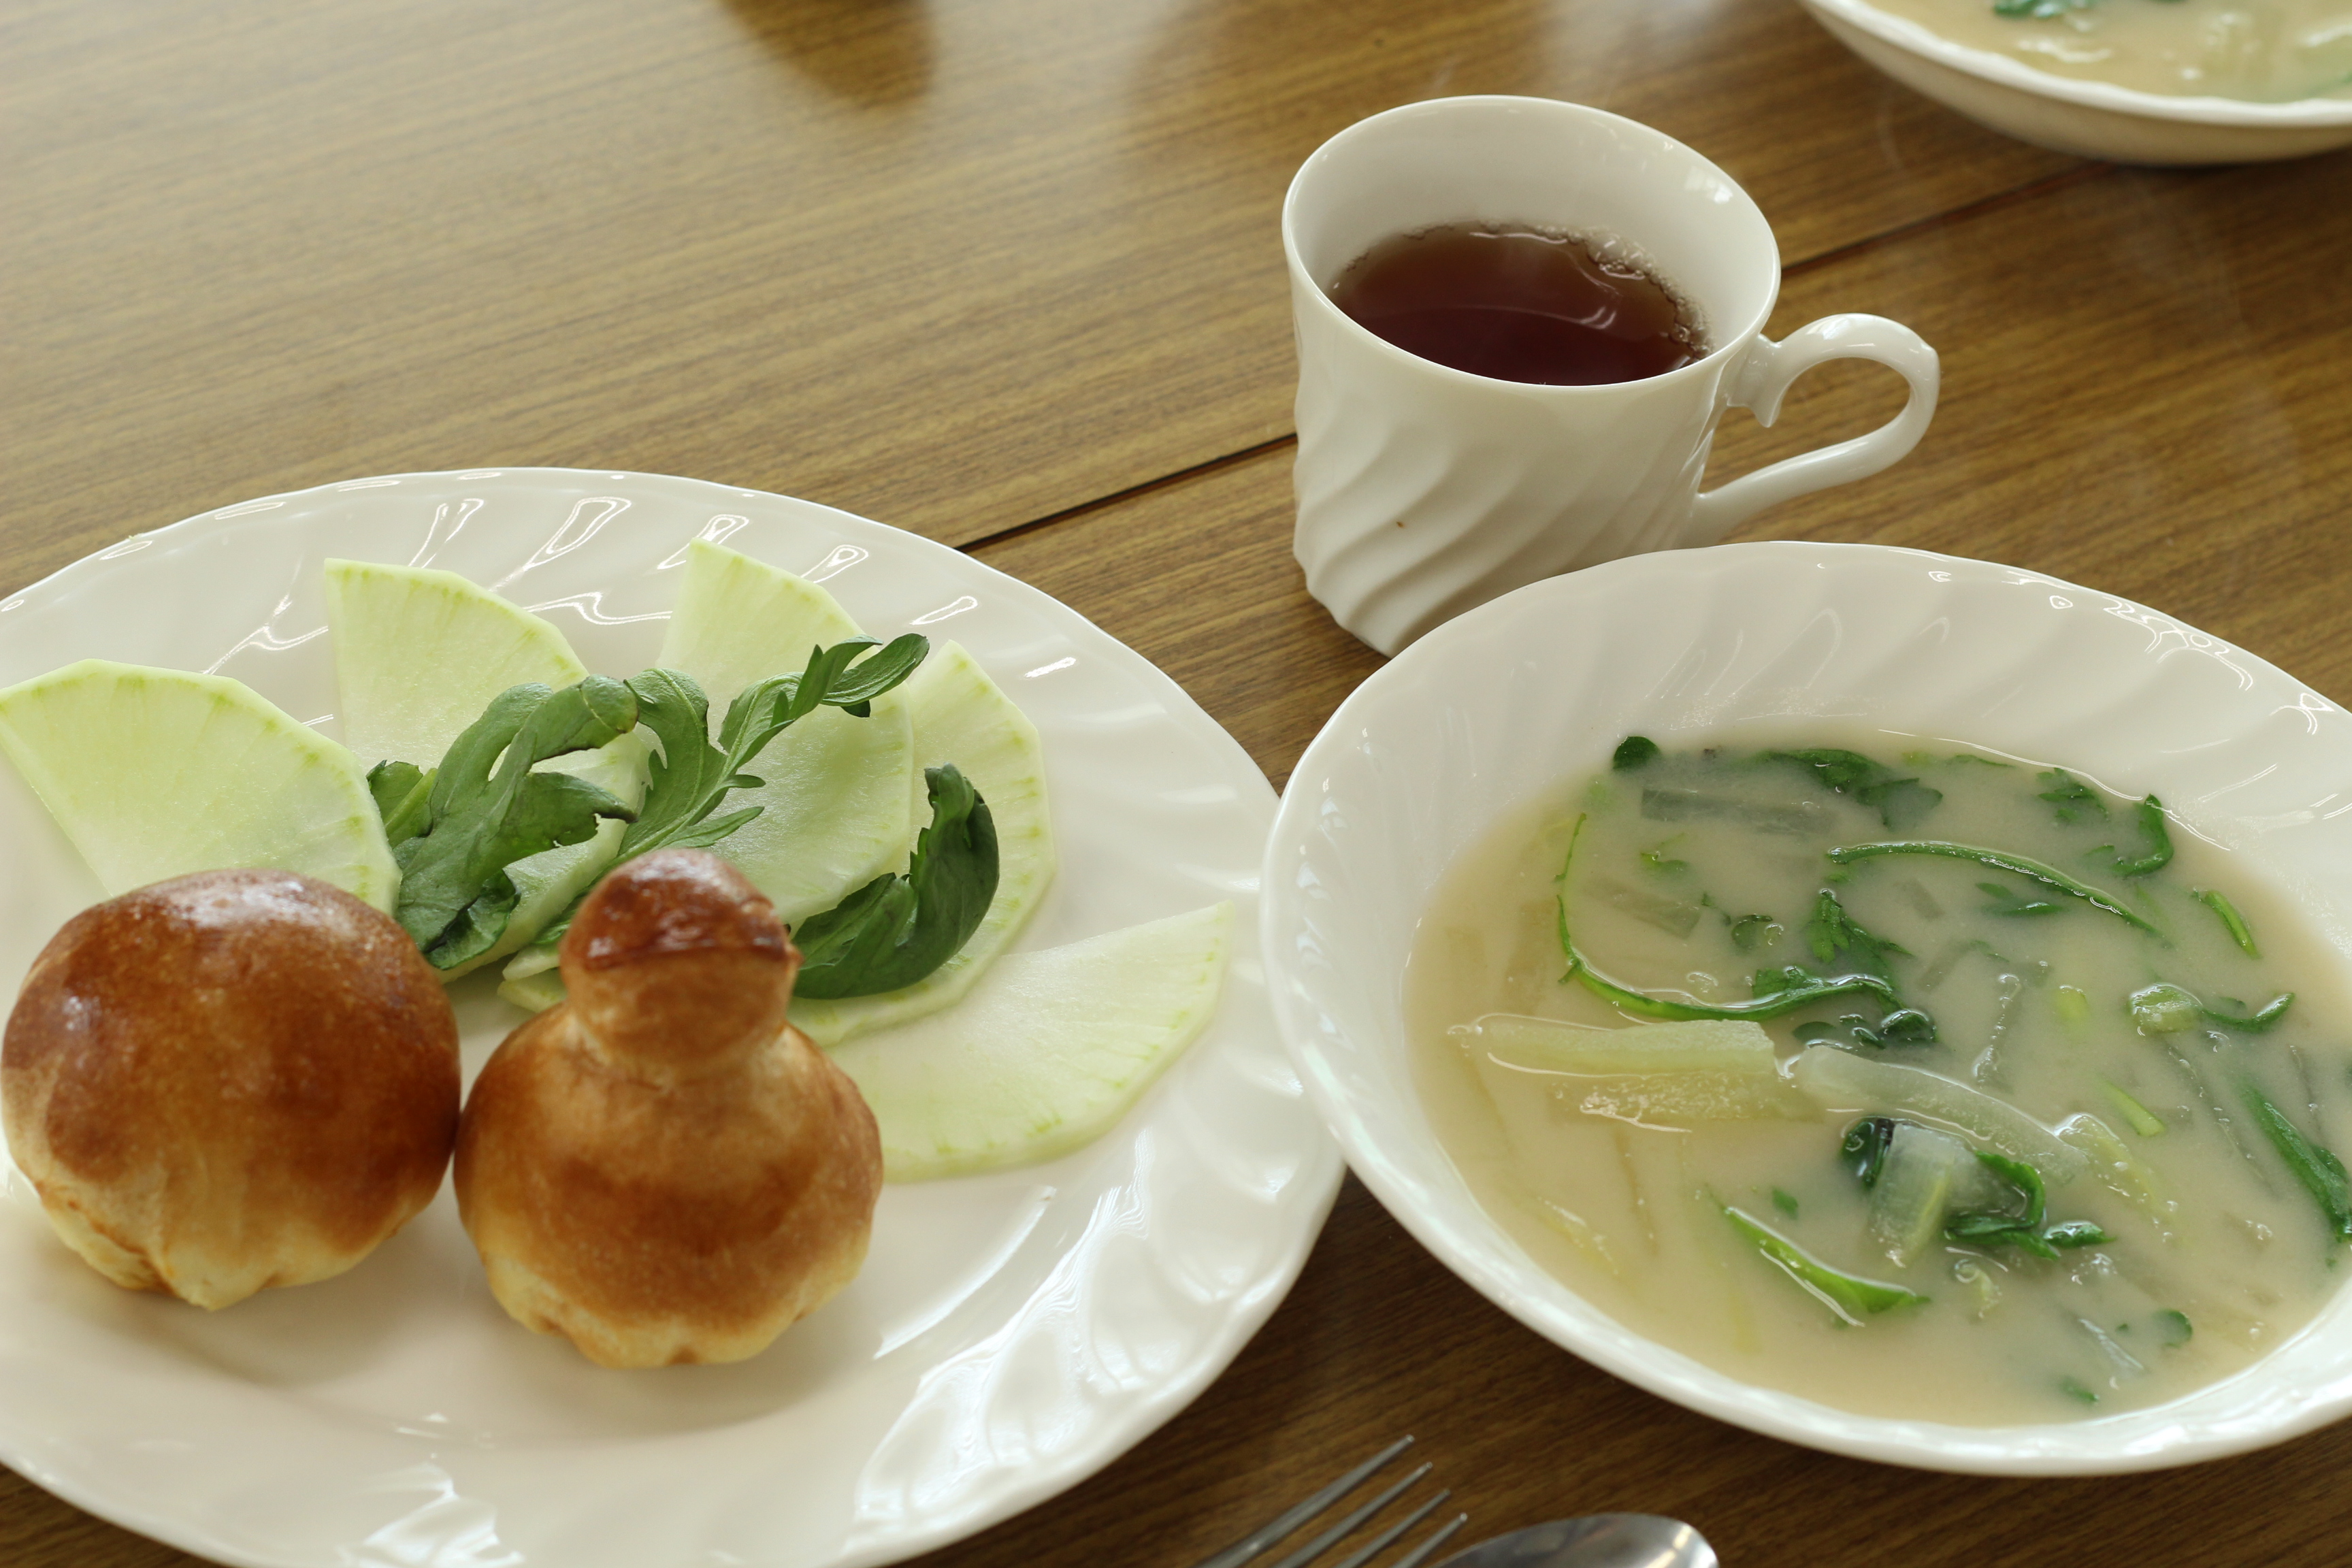 a-ta-sante糖質制限パン料理教室。阿倍野区西田辺の会館でのレッスン『ブリオッシュ』インスタントドライイースト。